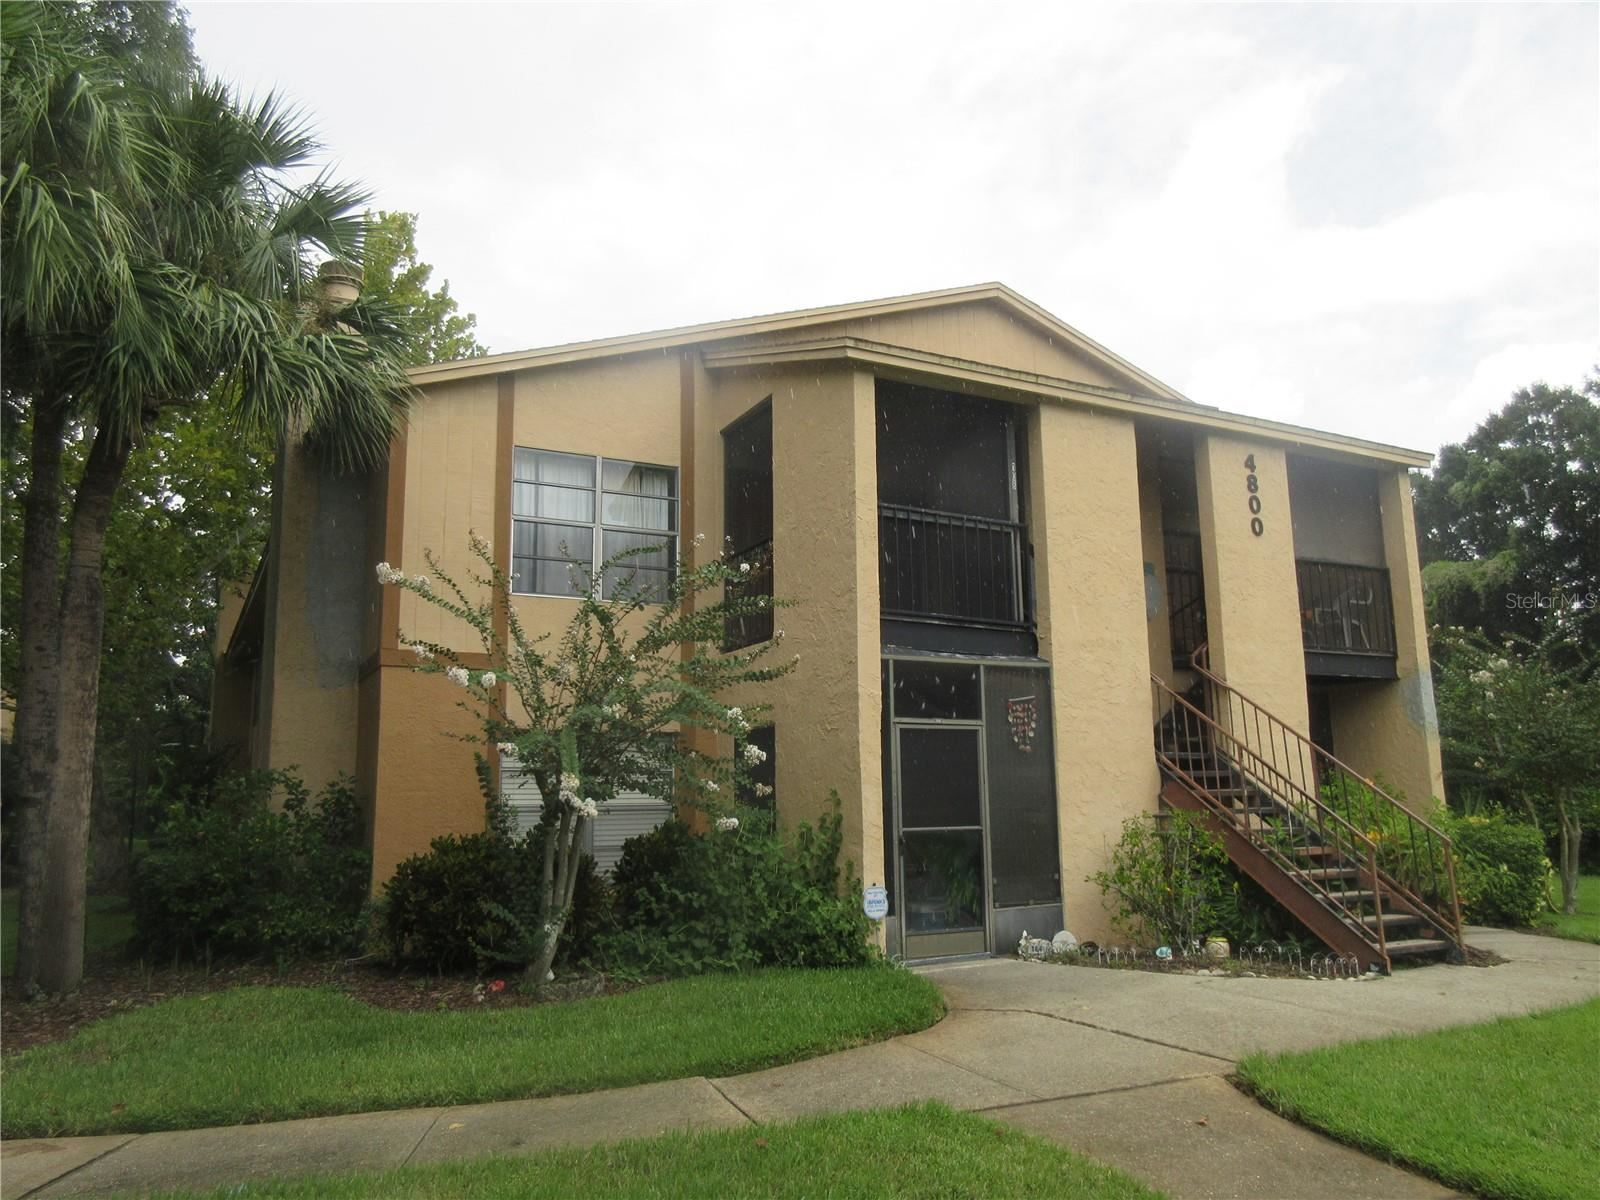 4800 S SEMORAN BOULEVARD #108, Orlando, FL 32822 - MLS#: O5973821